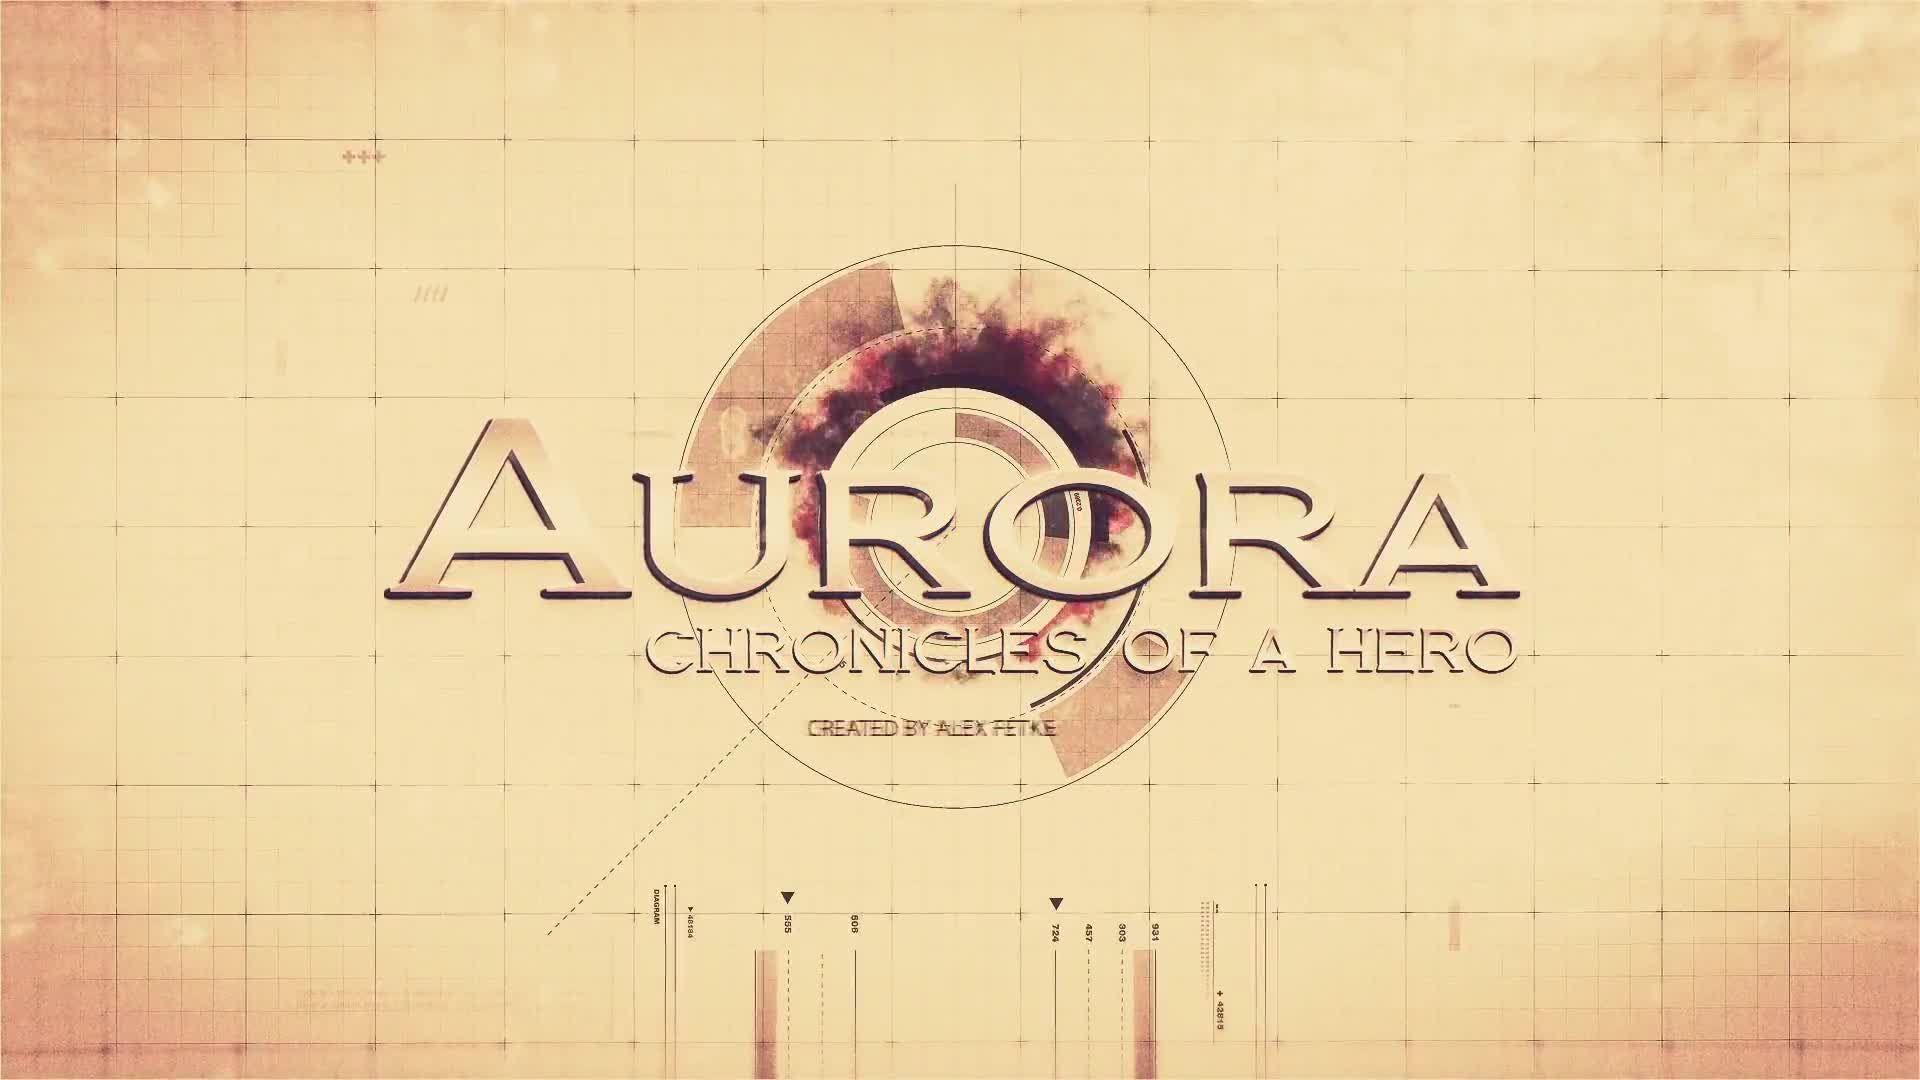 Aurora Chronicles of a Hero